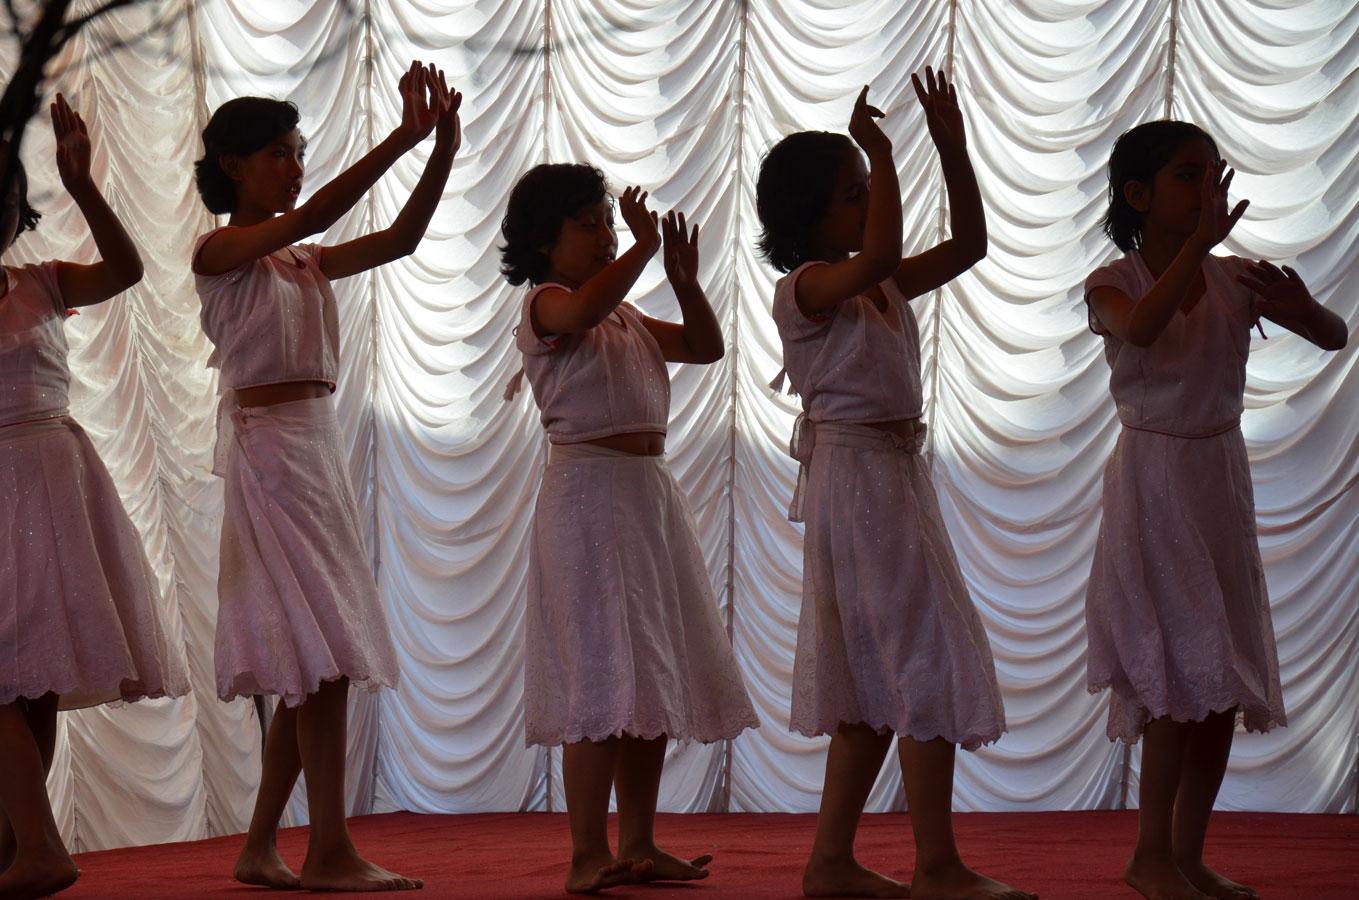 Unsere Tänzerinnen